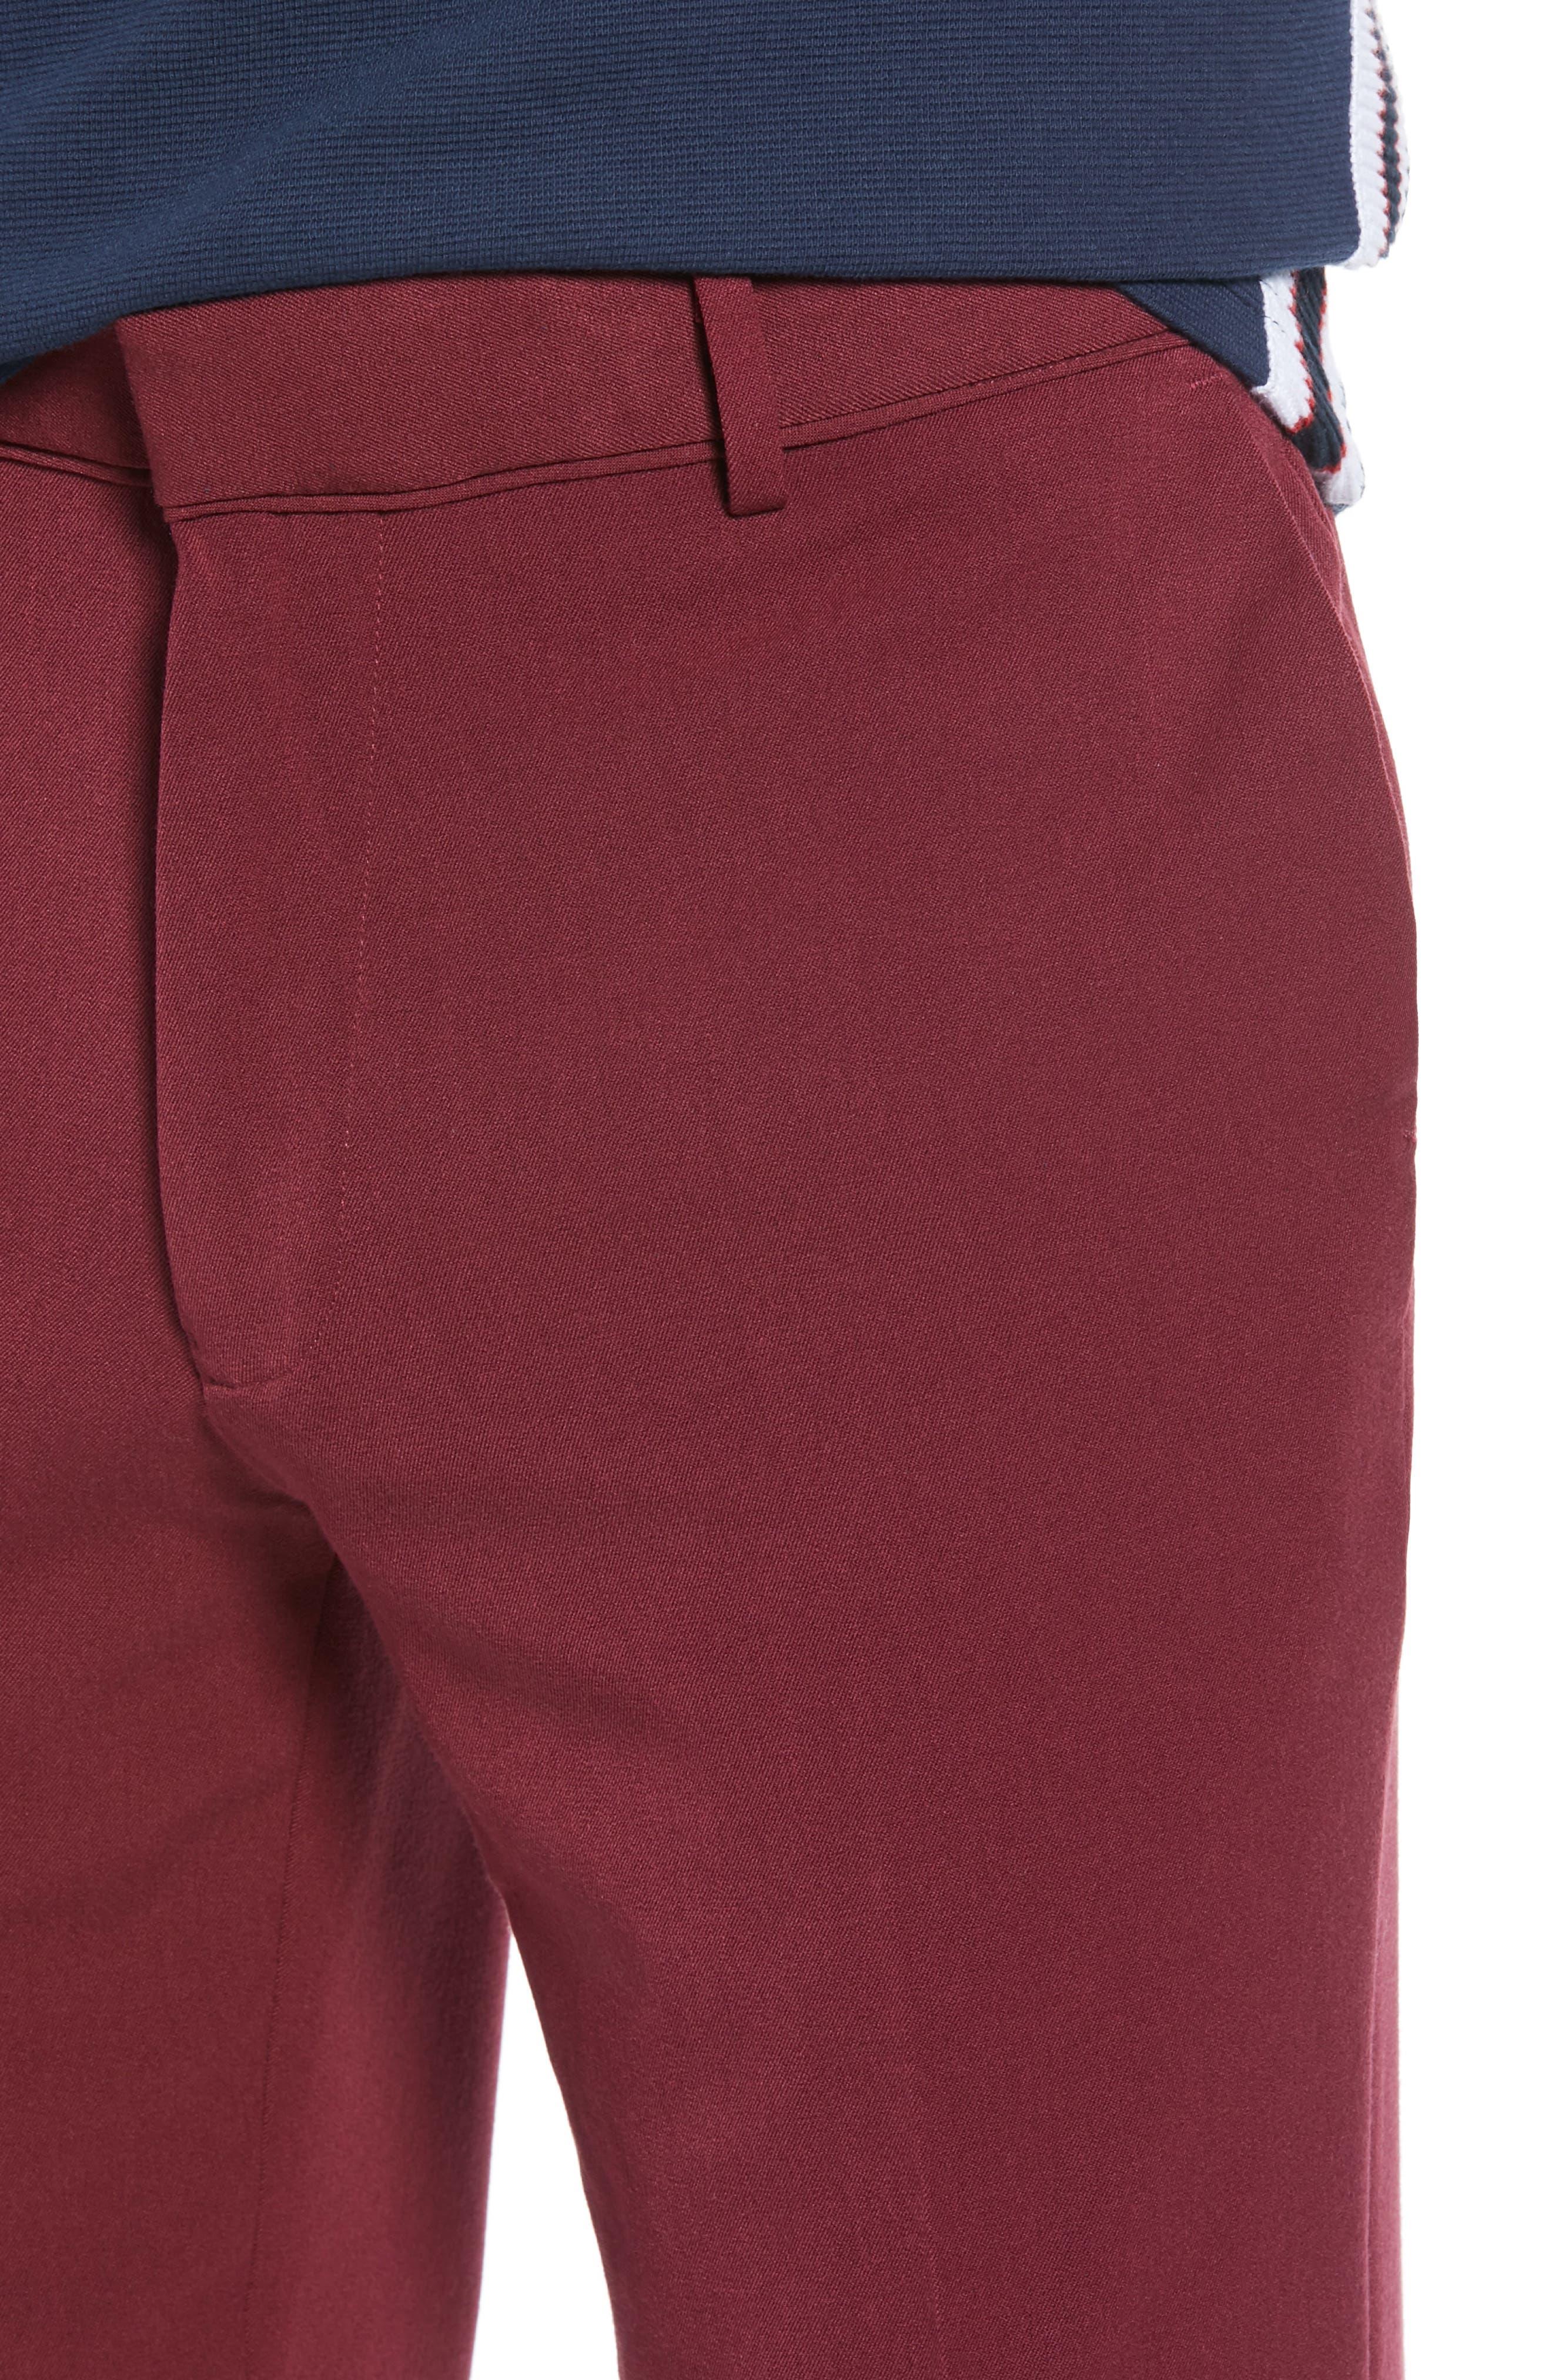 Skinny Fit Trousers,                             Alternate thumbnail 4, color,                             PURPLE